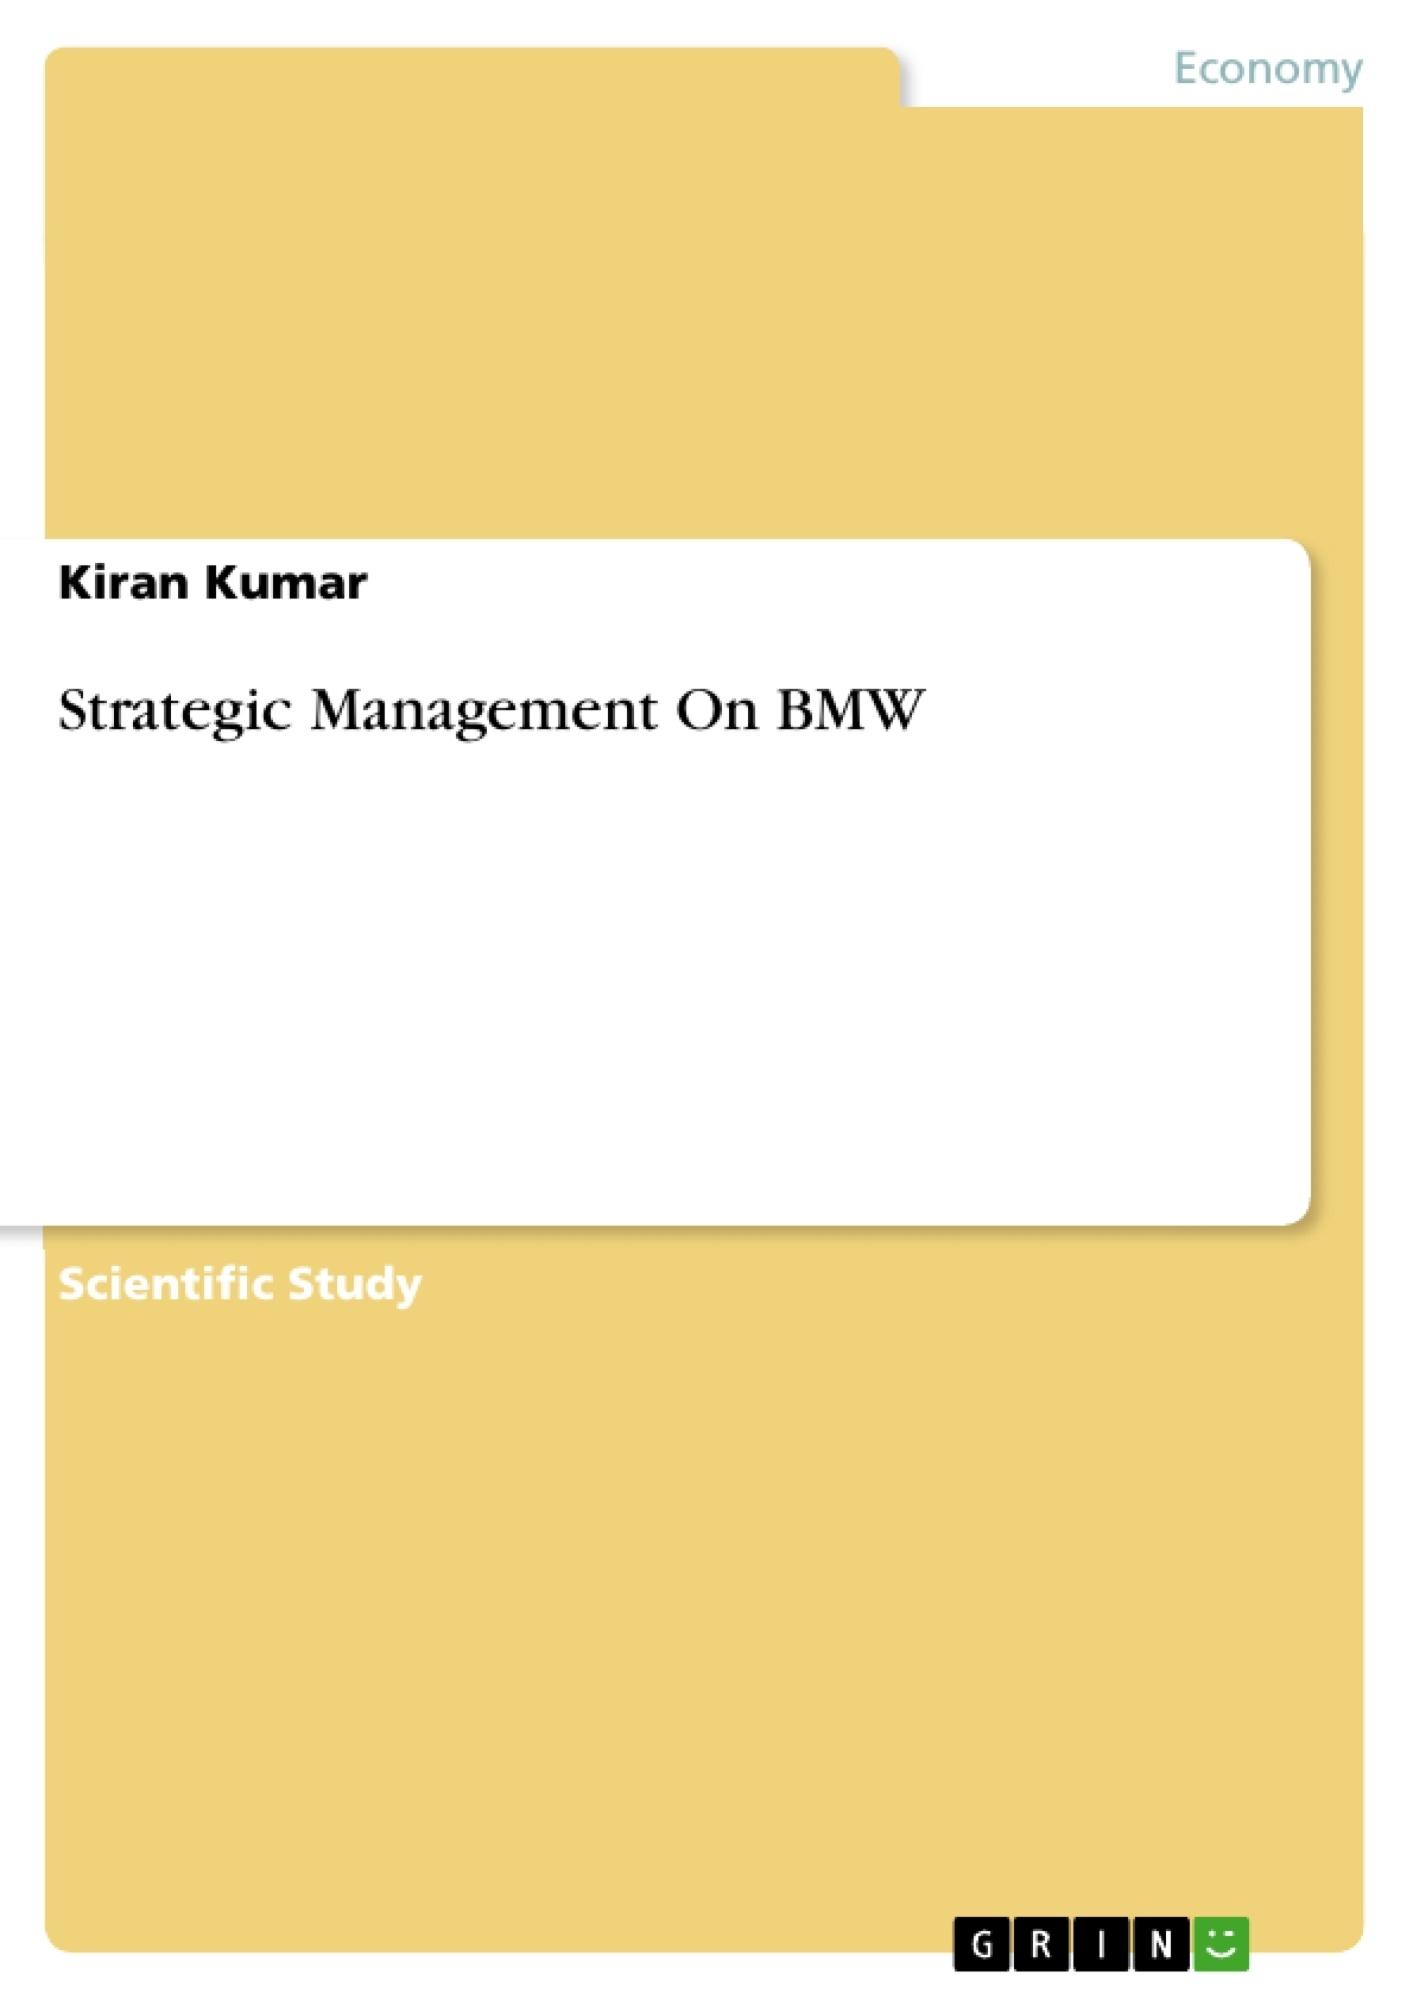 Title: Strategic Management On BMW